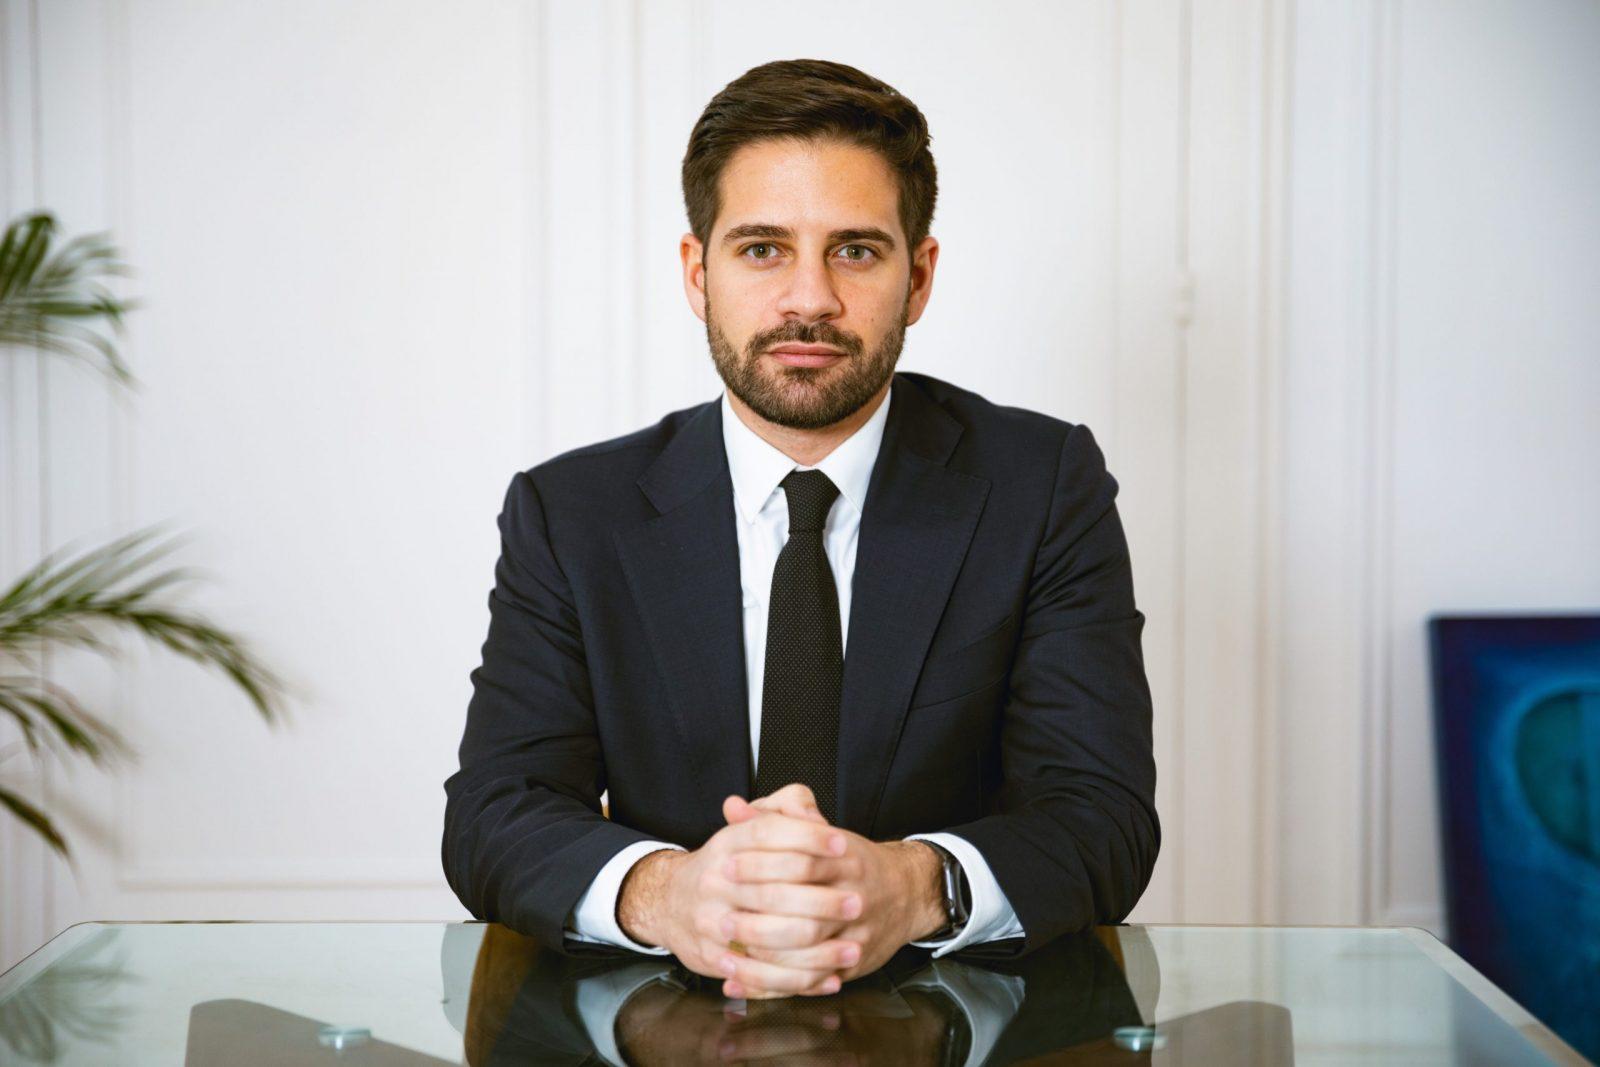 Interview de Maître Loïc Alvarez